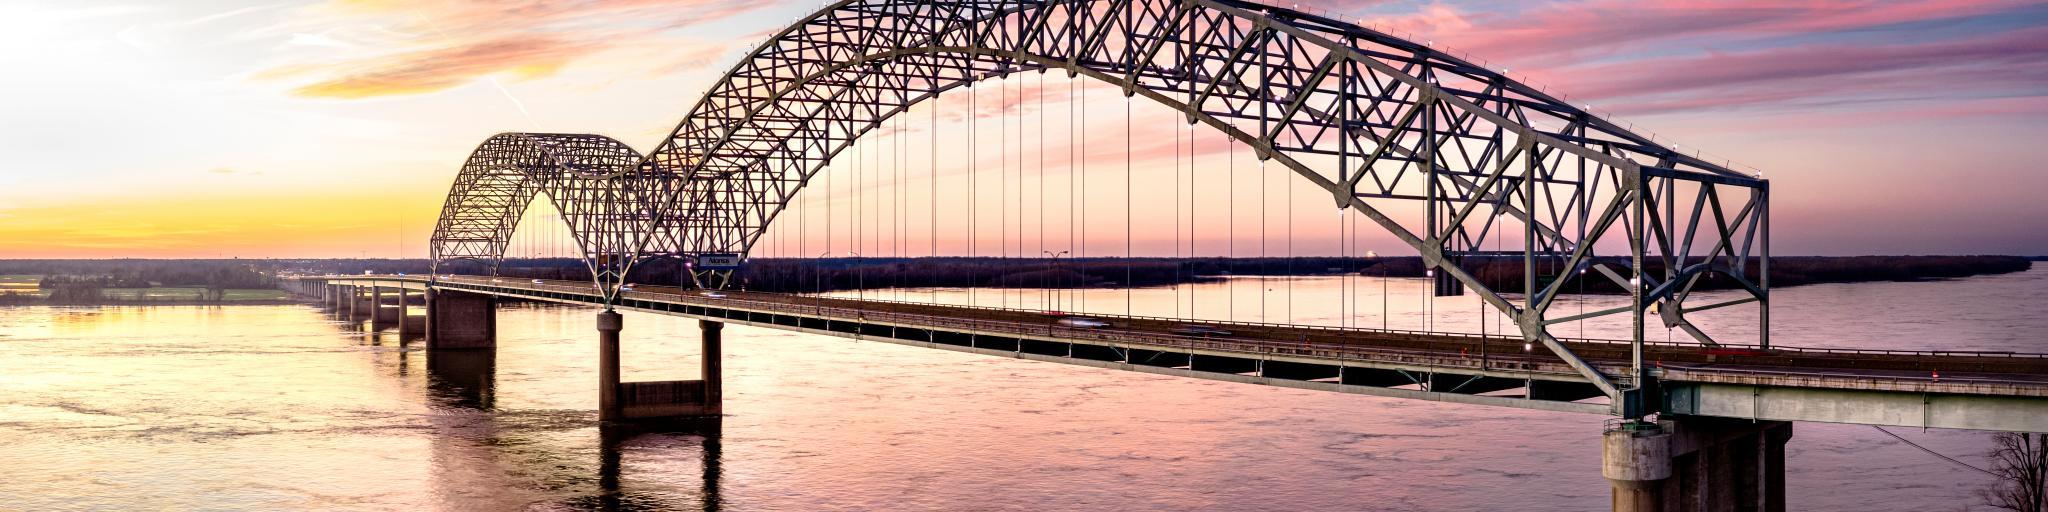 Hernando de Soto Bridge connecting Memphis, Tennessee with West Memphis, Arkansas at sunset.